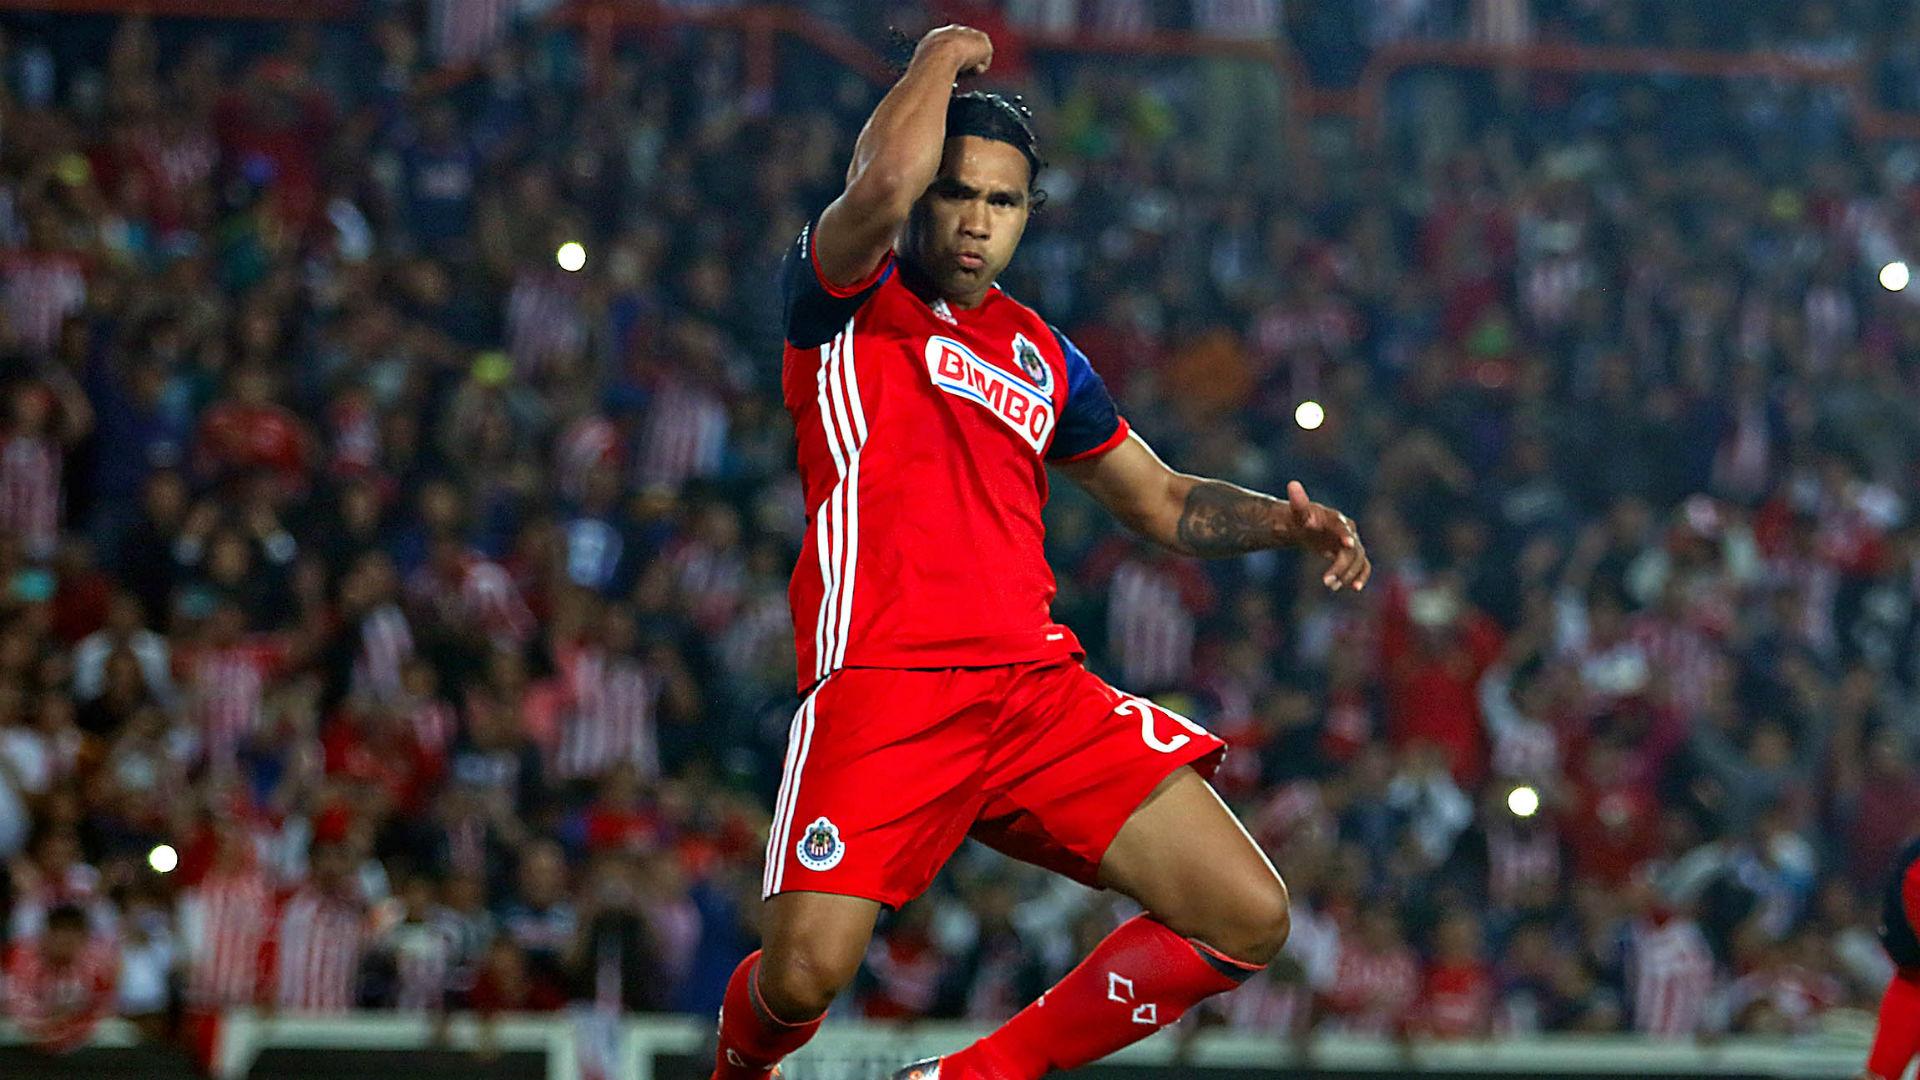 Pachuca vs Chivas 23042016 J15 Liga MX Carlos Gullit Peña